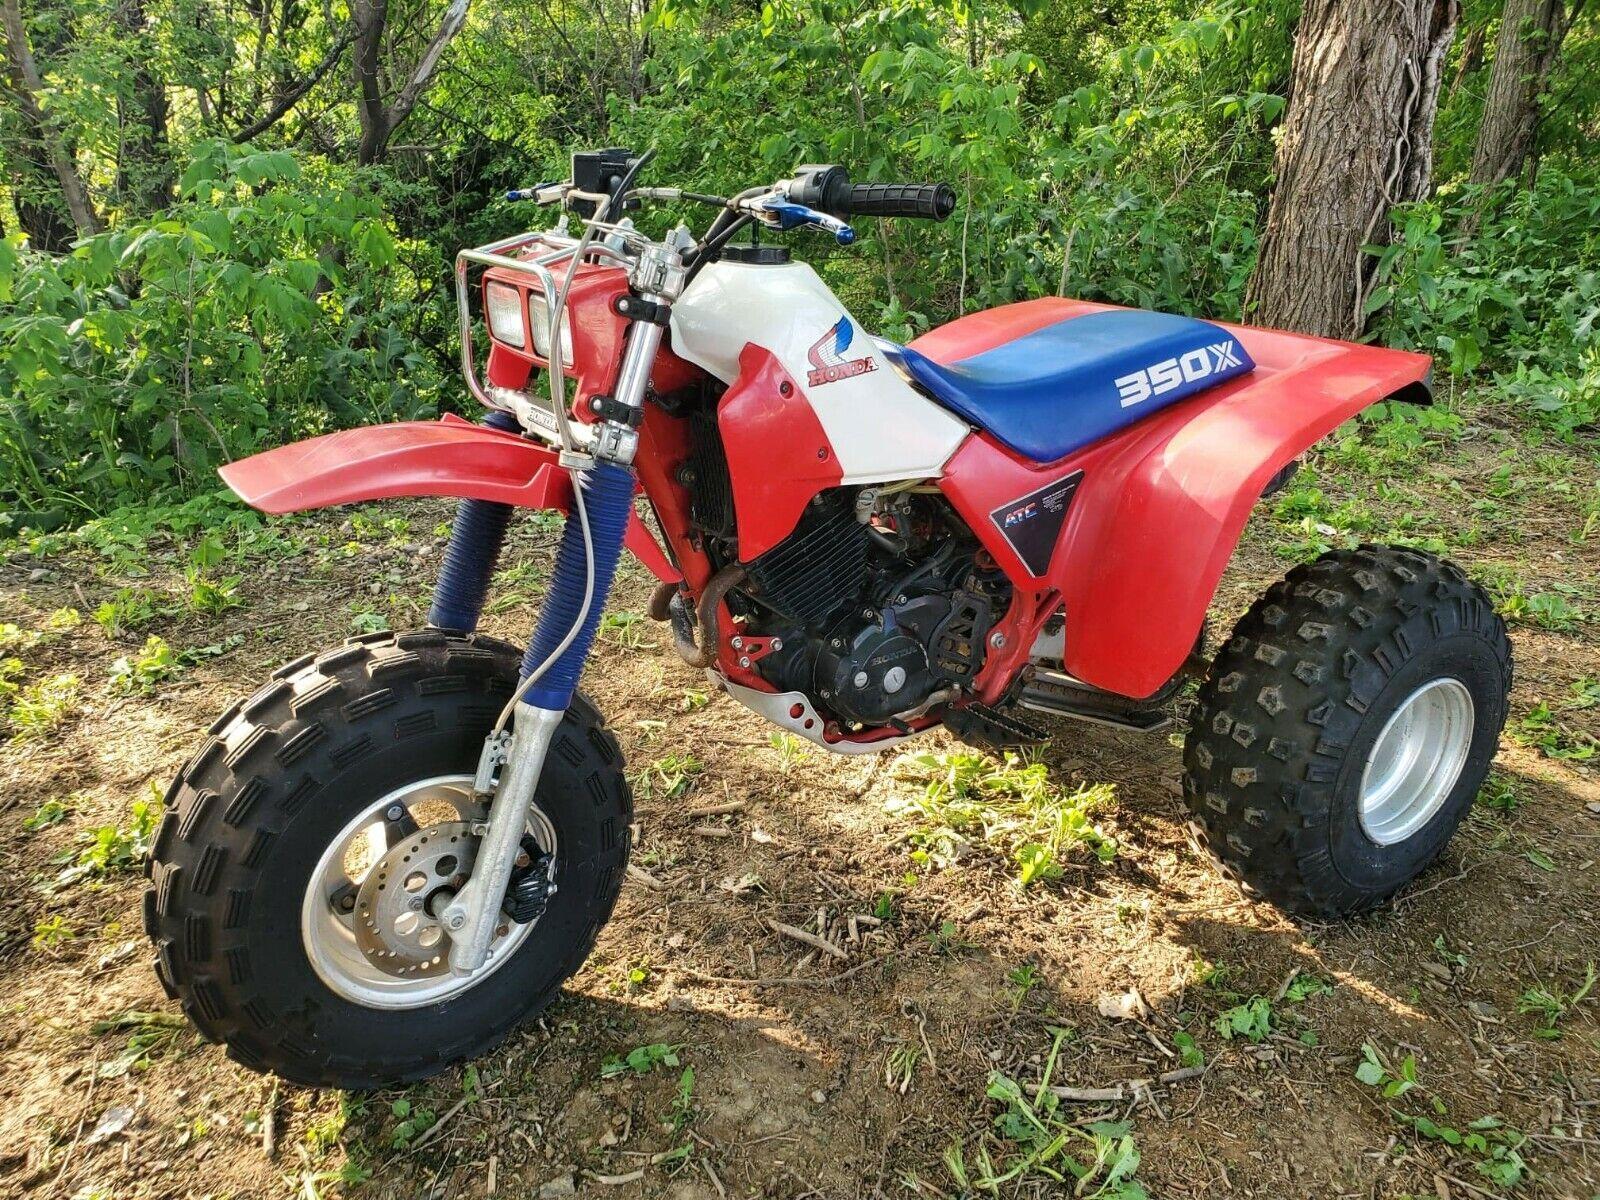 1985 HONDA ATC 350X - 3 WHEEL ATV - RED, WHITE & BLUE - ORIGINAL - MINT - 1 OF 2